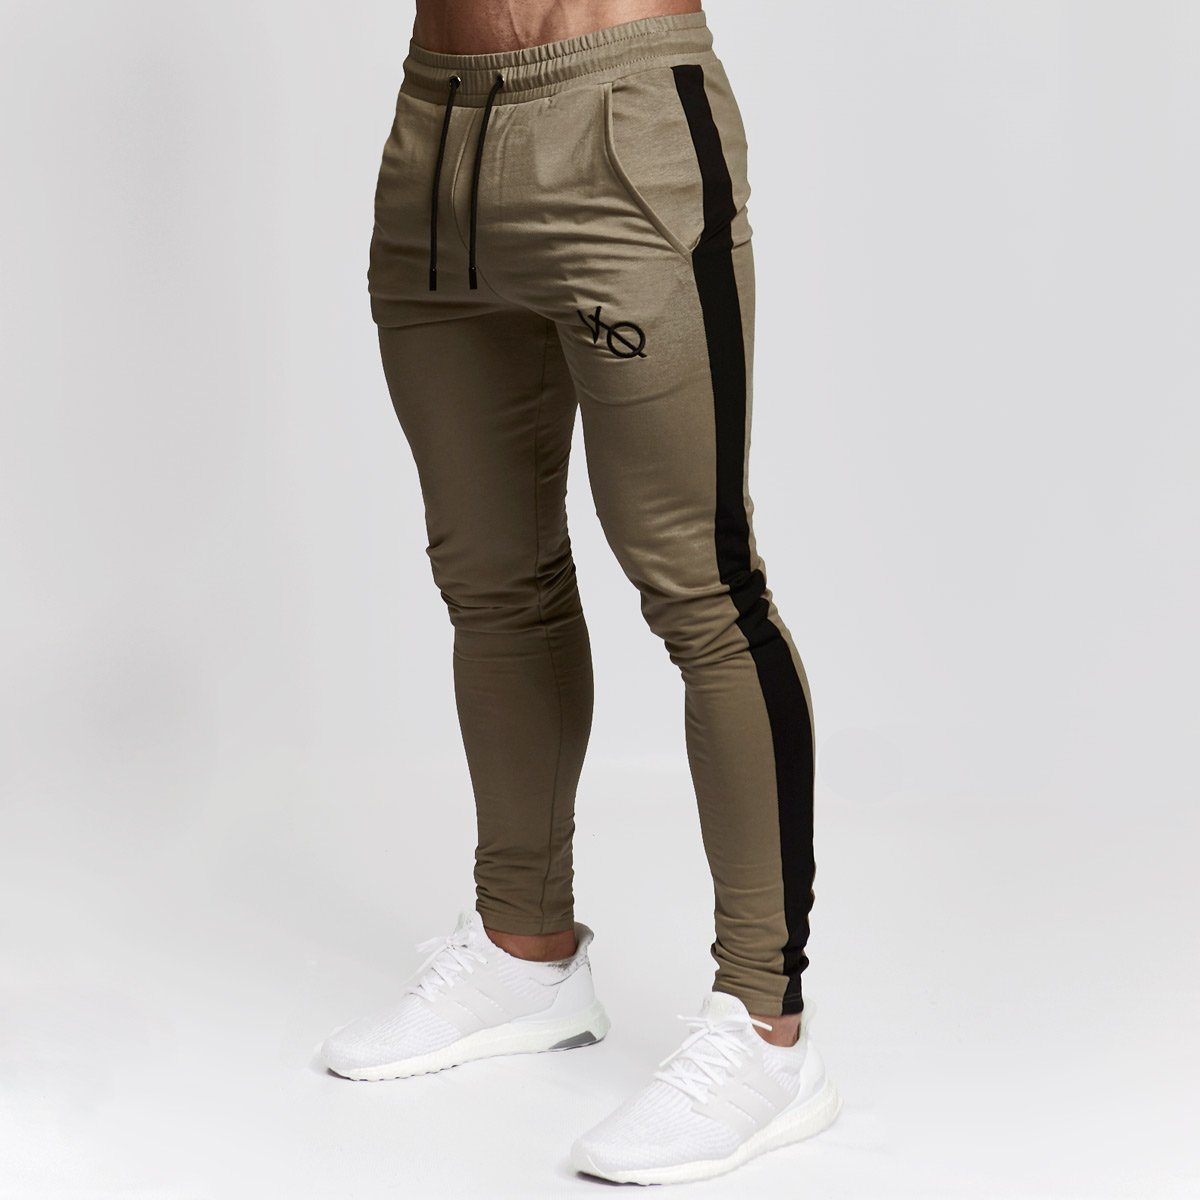 c405afbce China Wholesale Custom Your Design Cotton Zipper Pocket Joggers Sweatpants  Men Gym Track Pants - China Man Pant, Track Pants